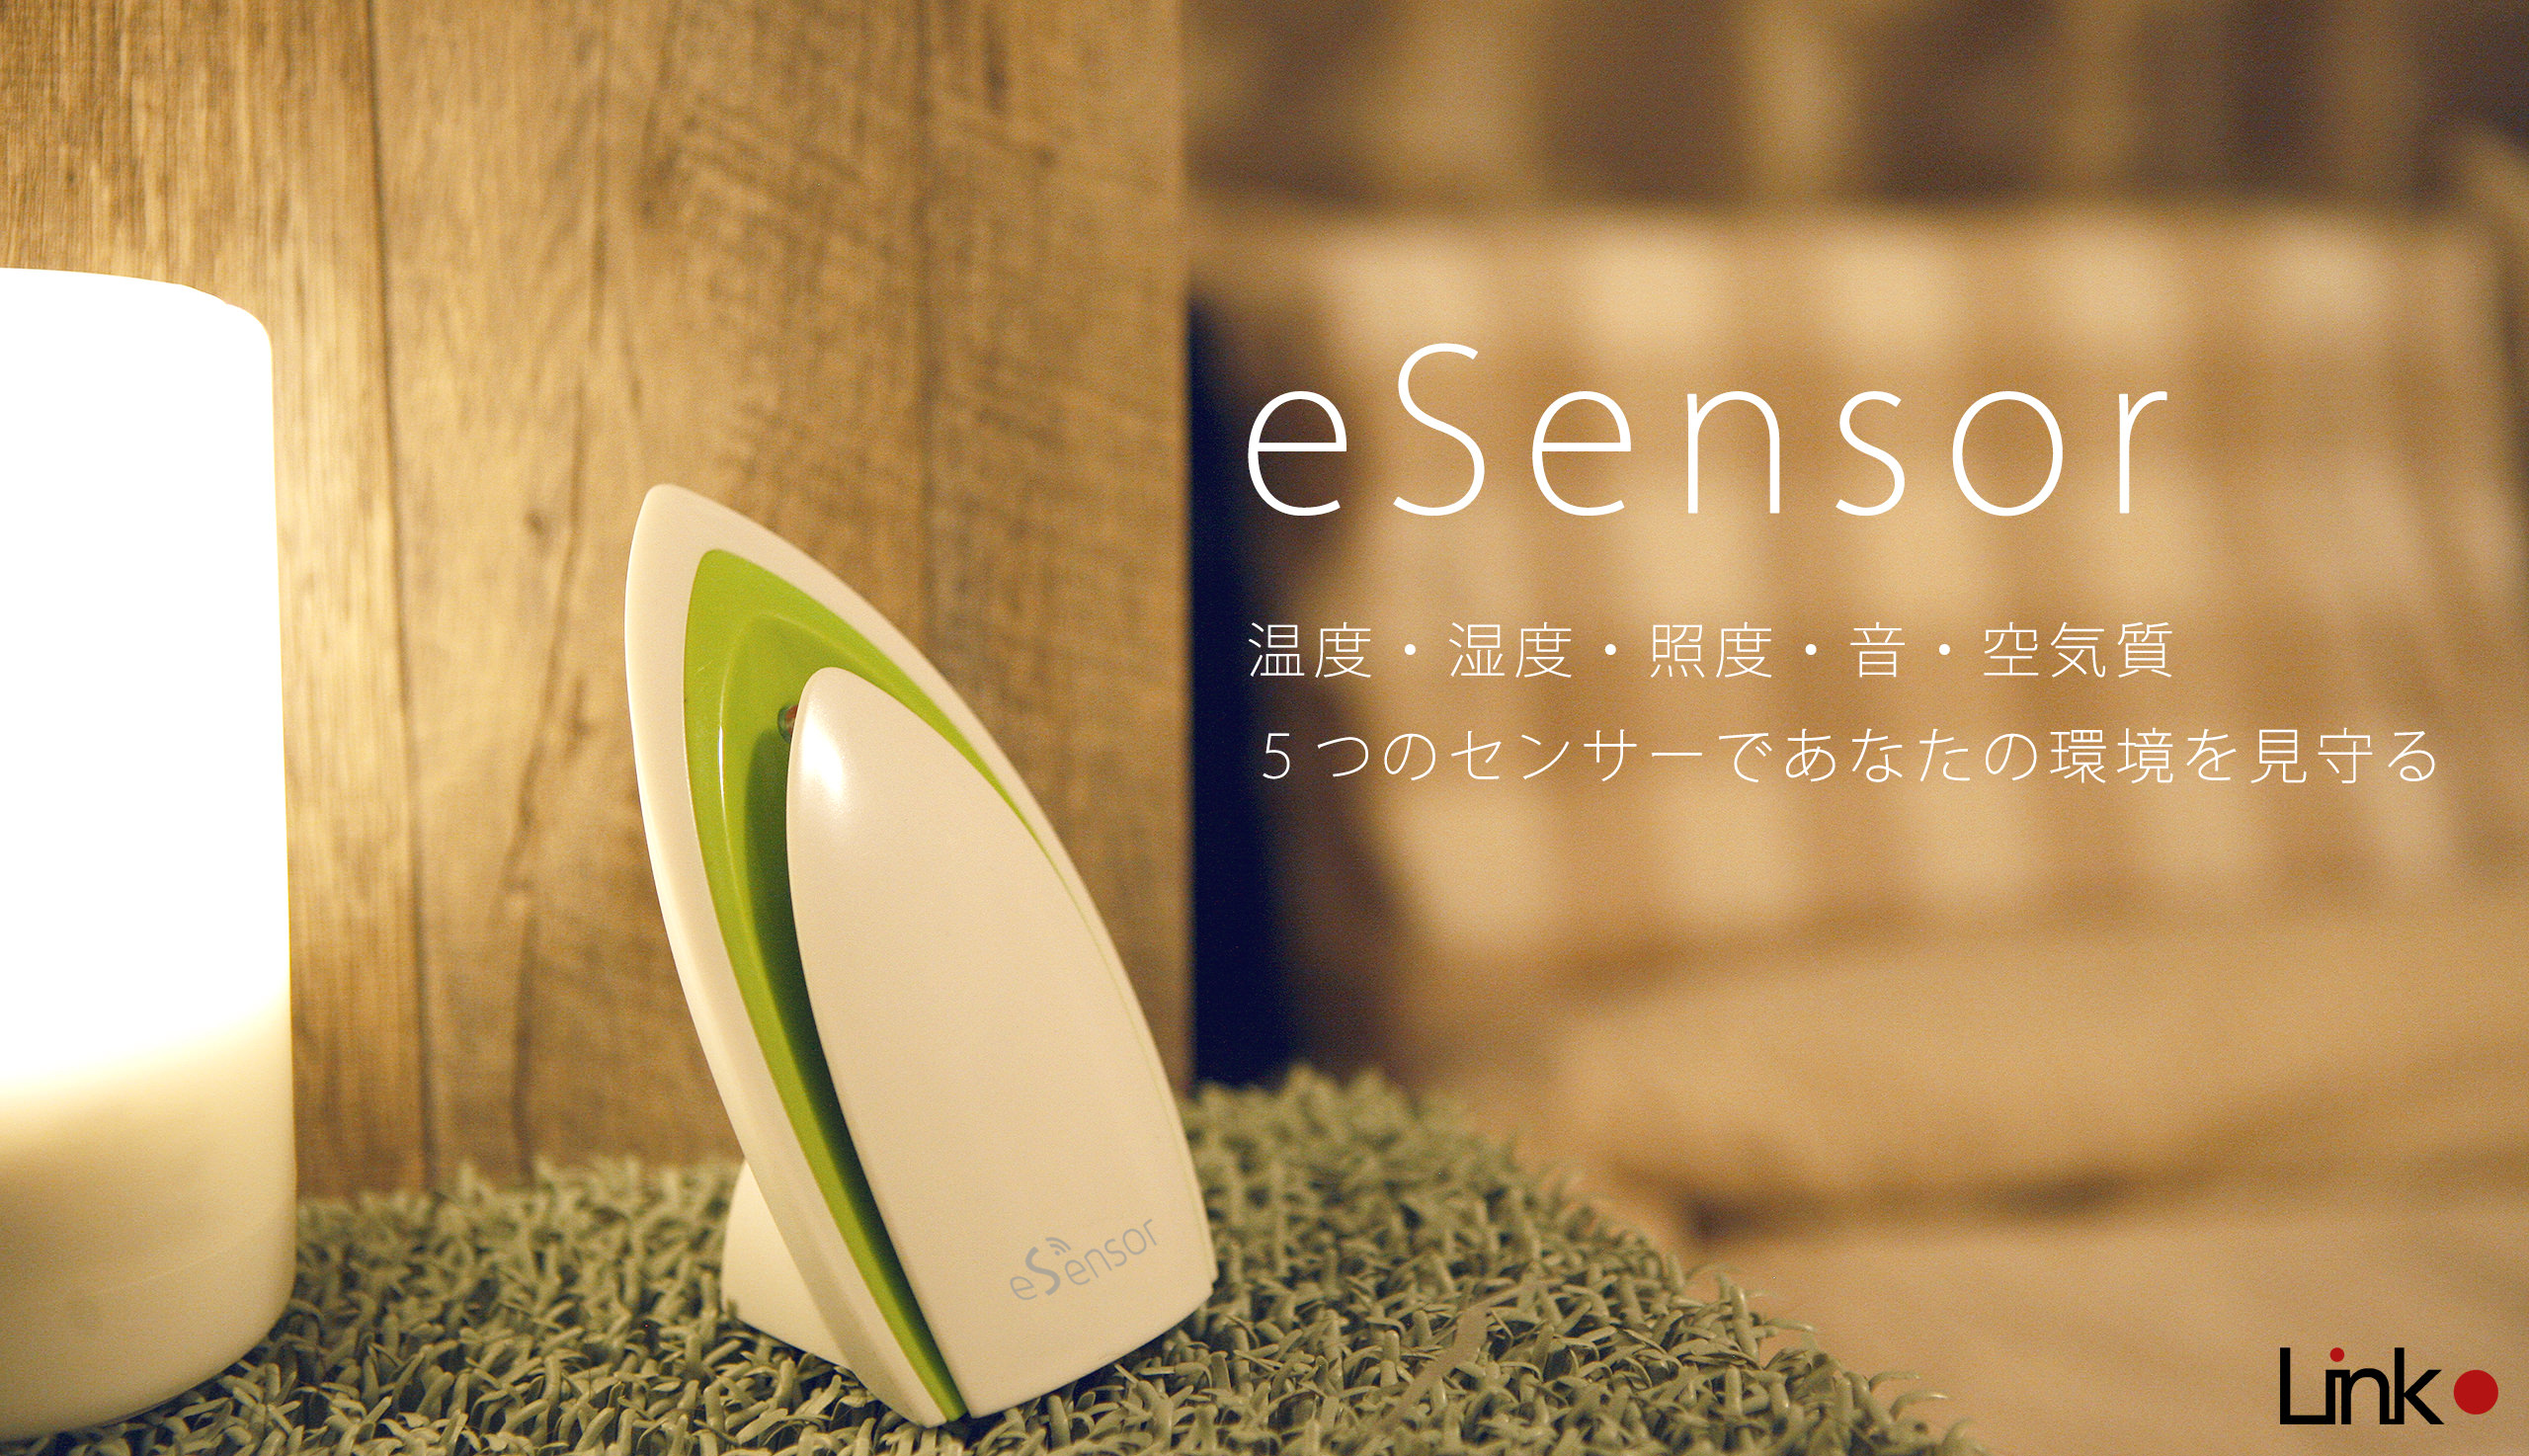 eSensor|IoT 家電 スマートホーム・スマートハウス|Link Japanメイン画像